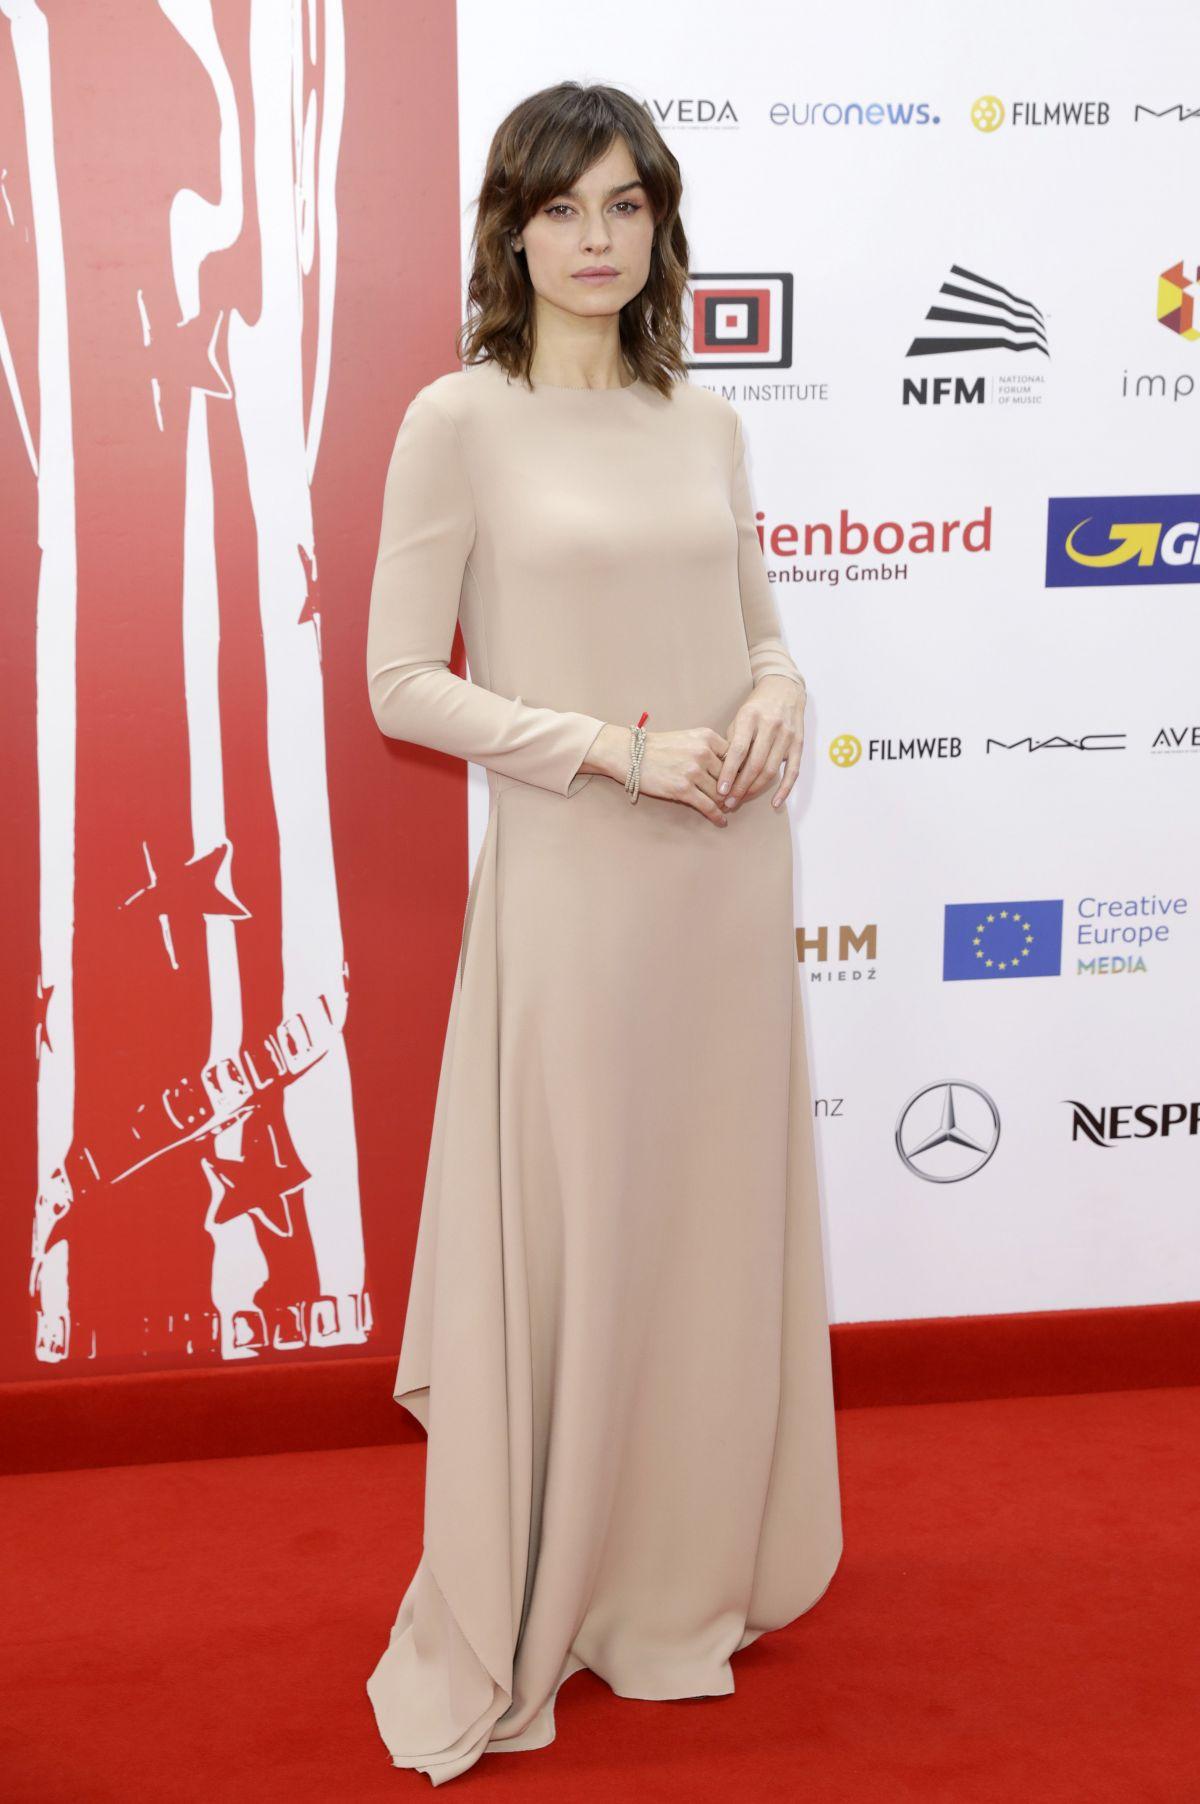 Leaked Kasia Smutniak nude photos 2019